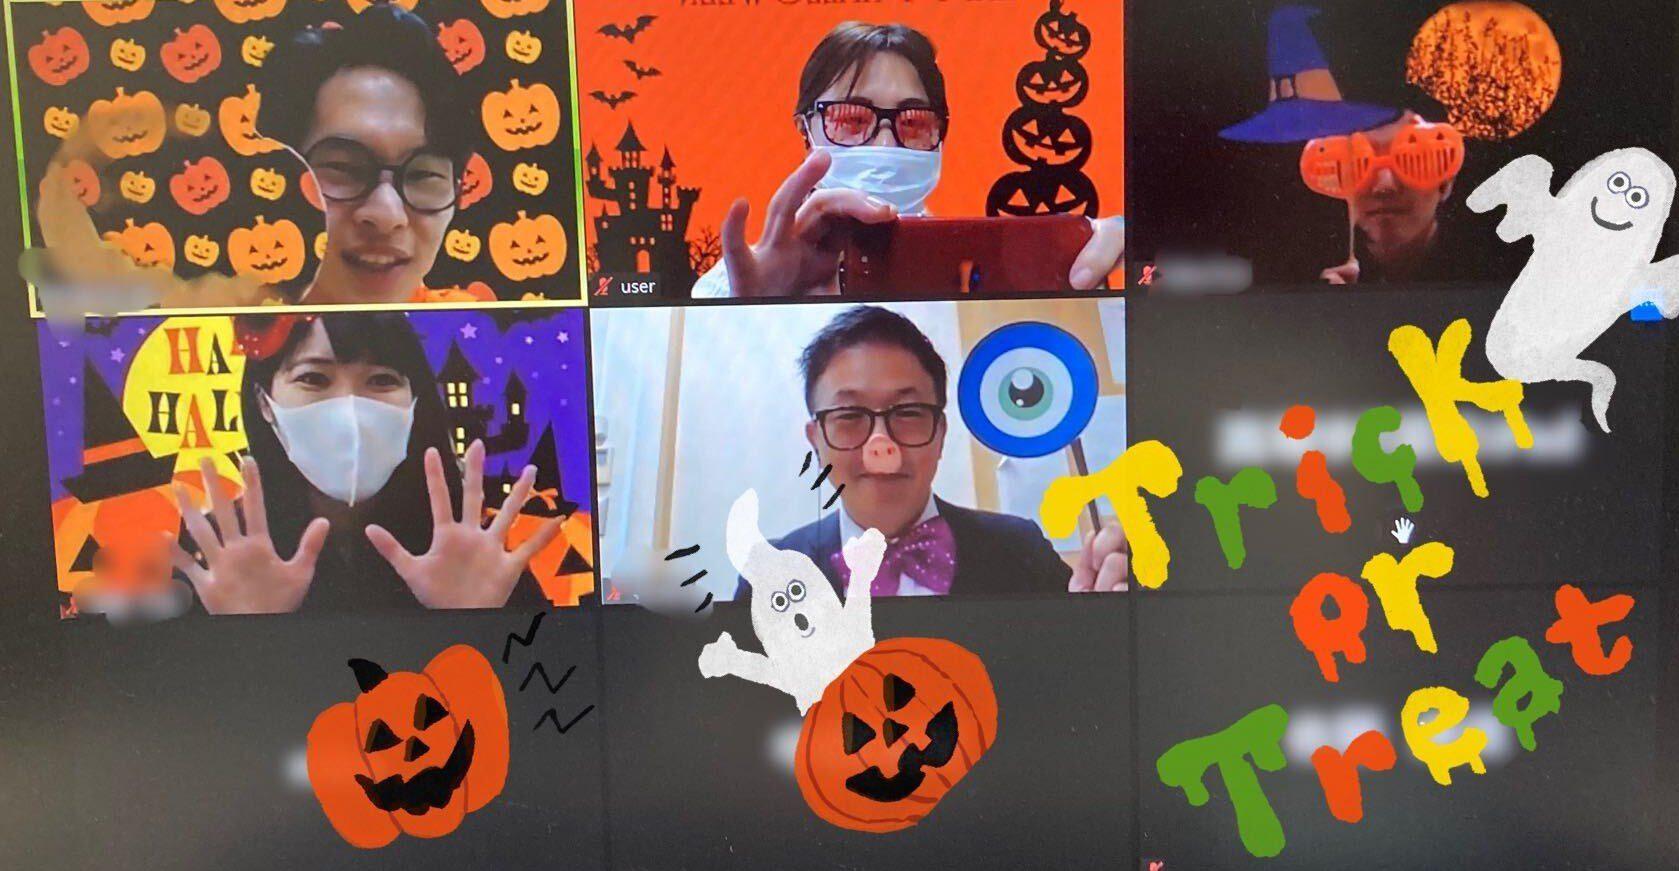 ♪♪♪Happy Halloween♪♪♪